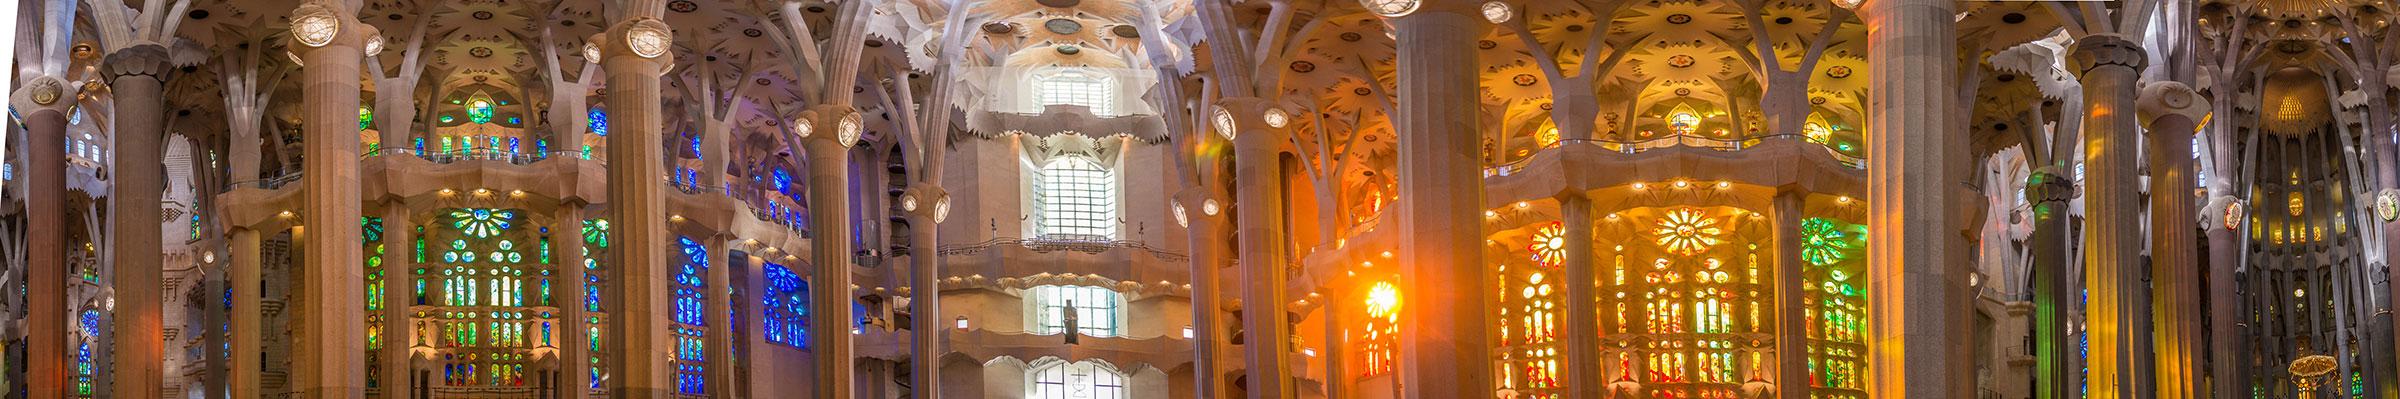 Barcelona - Sagrada Familia - Innenraum 360 Grad Panorama